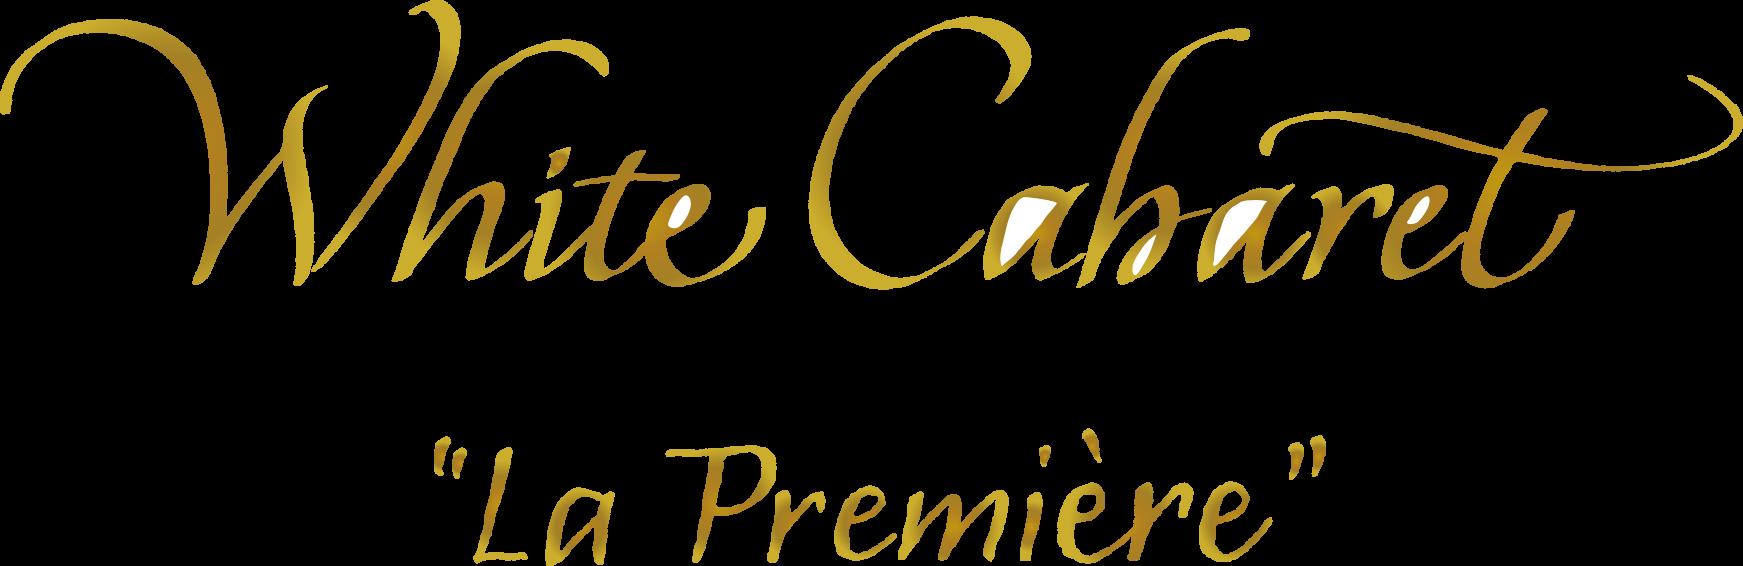 White Cabaret - La Première